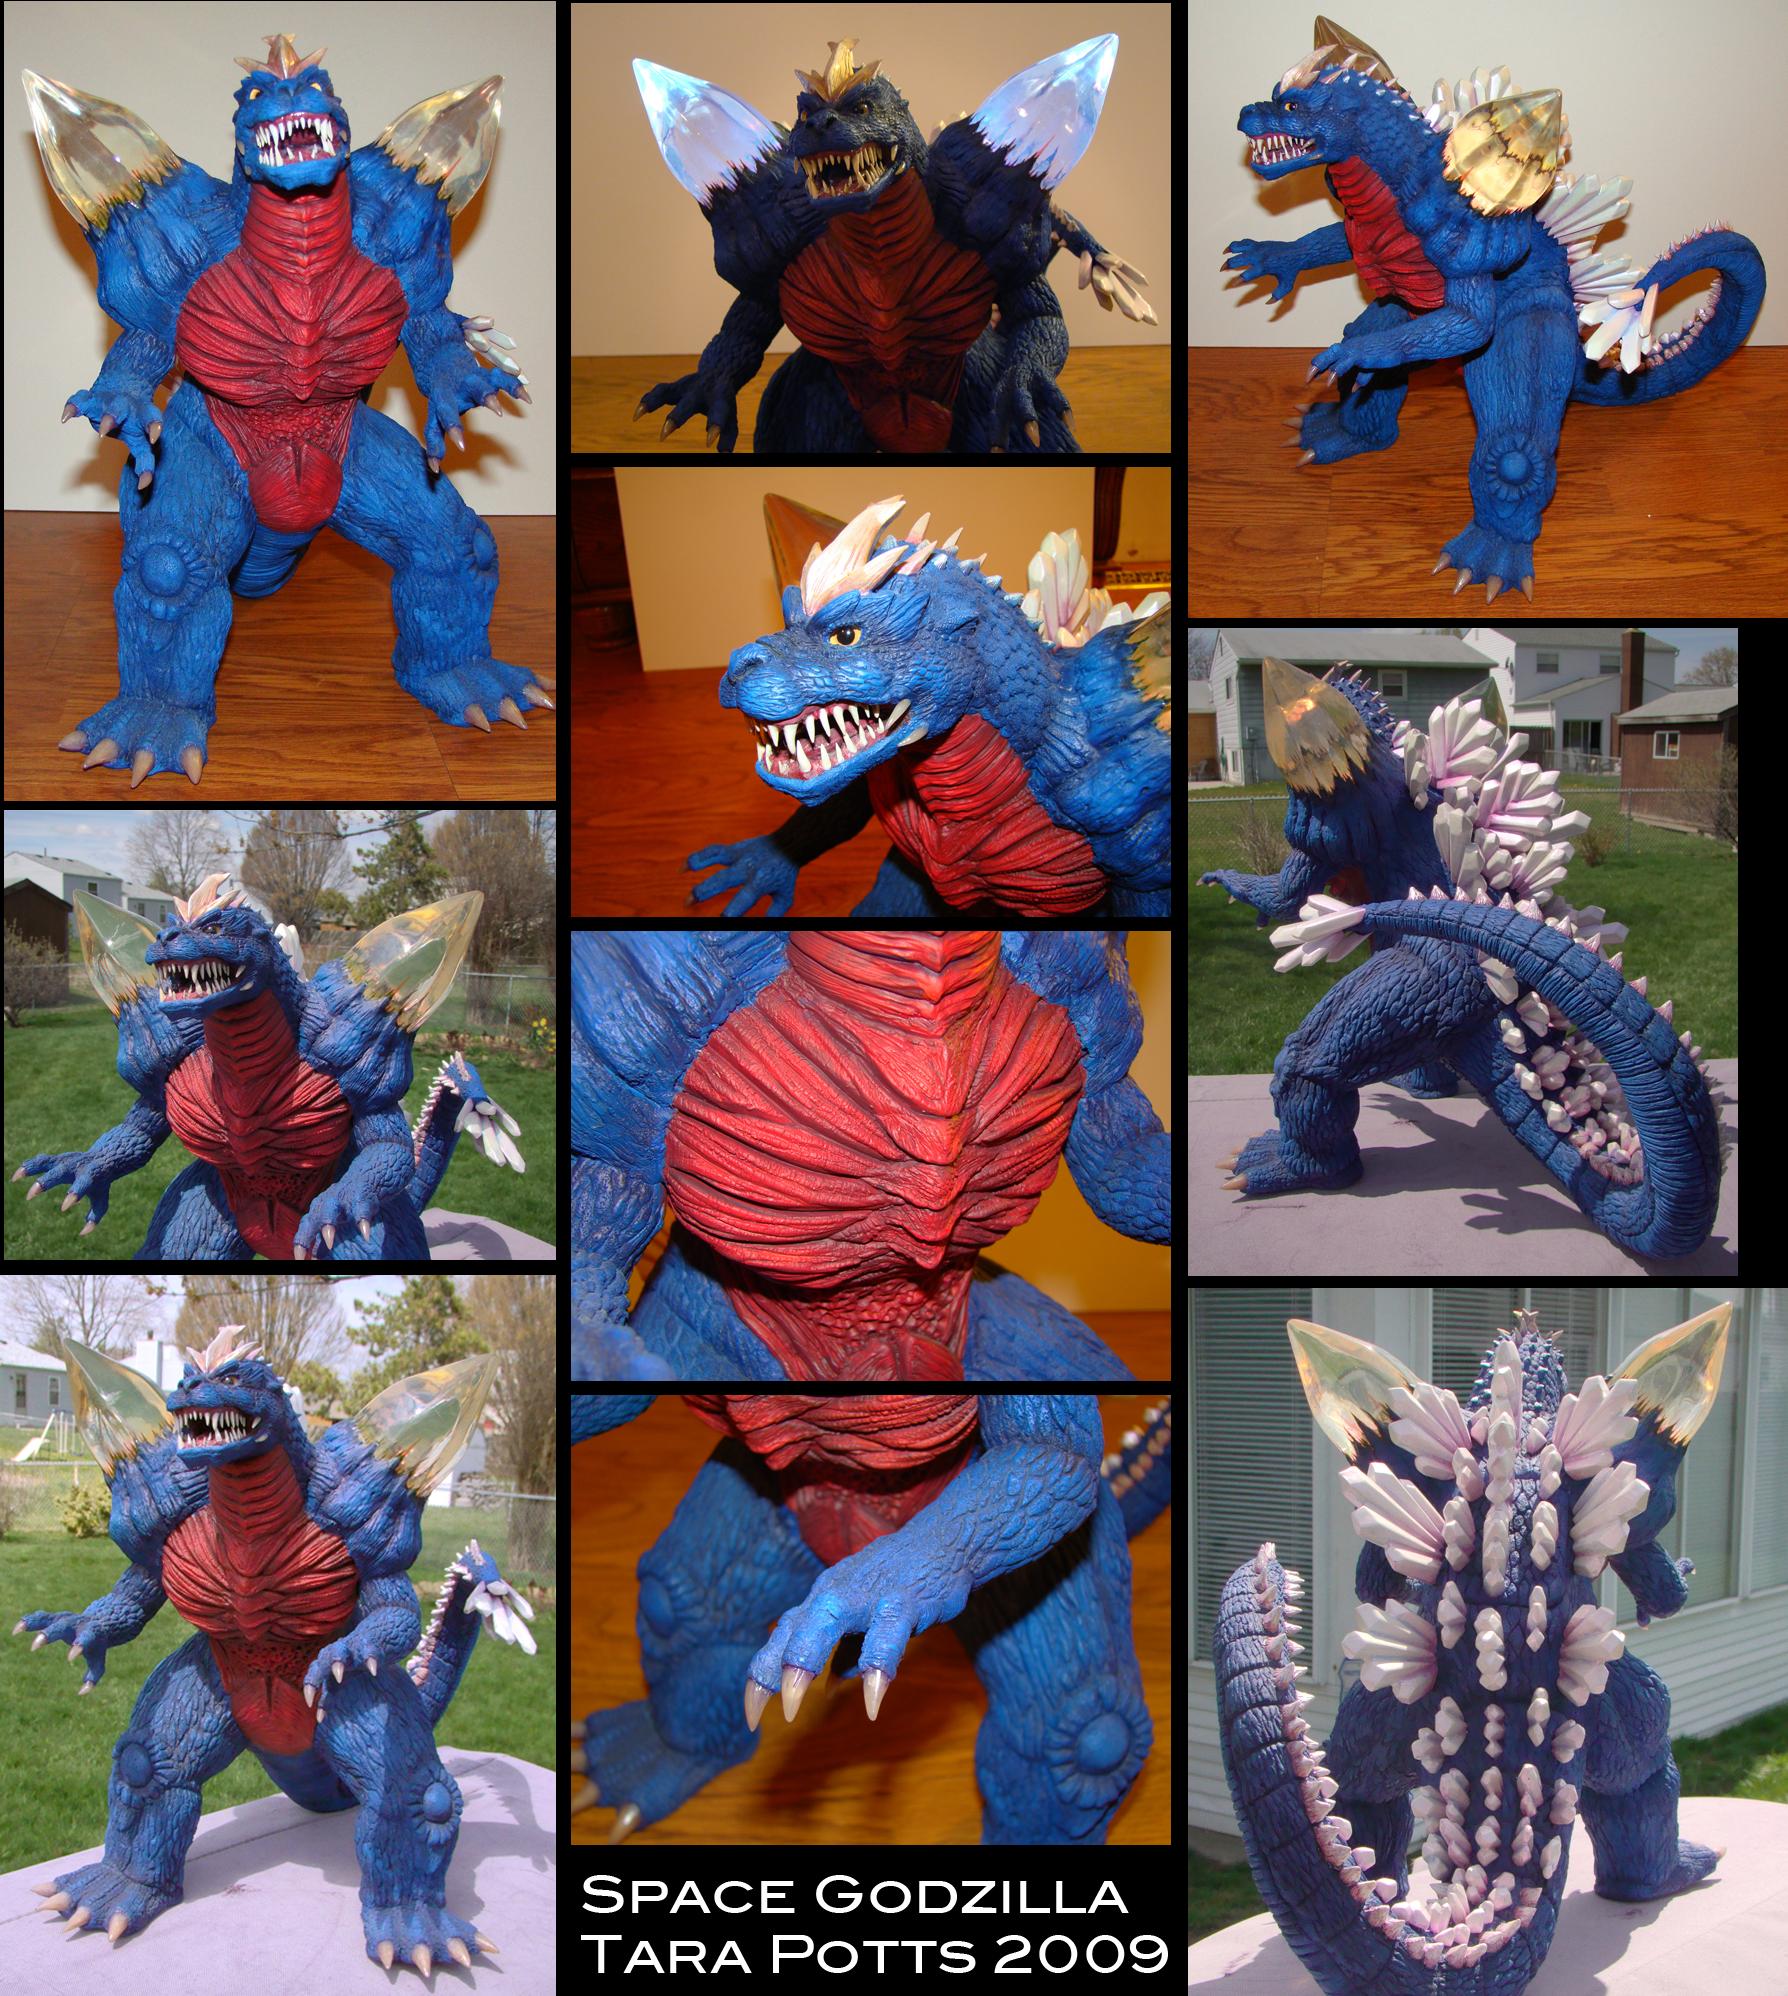 Space Godzilla sculpt by DragonosX